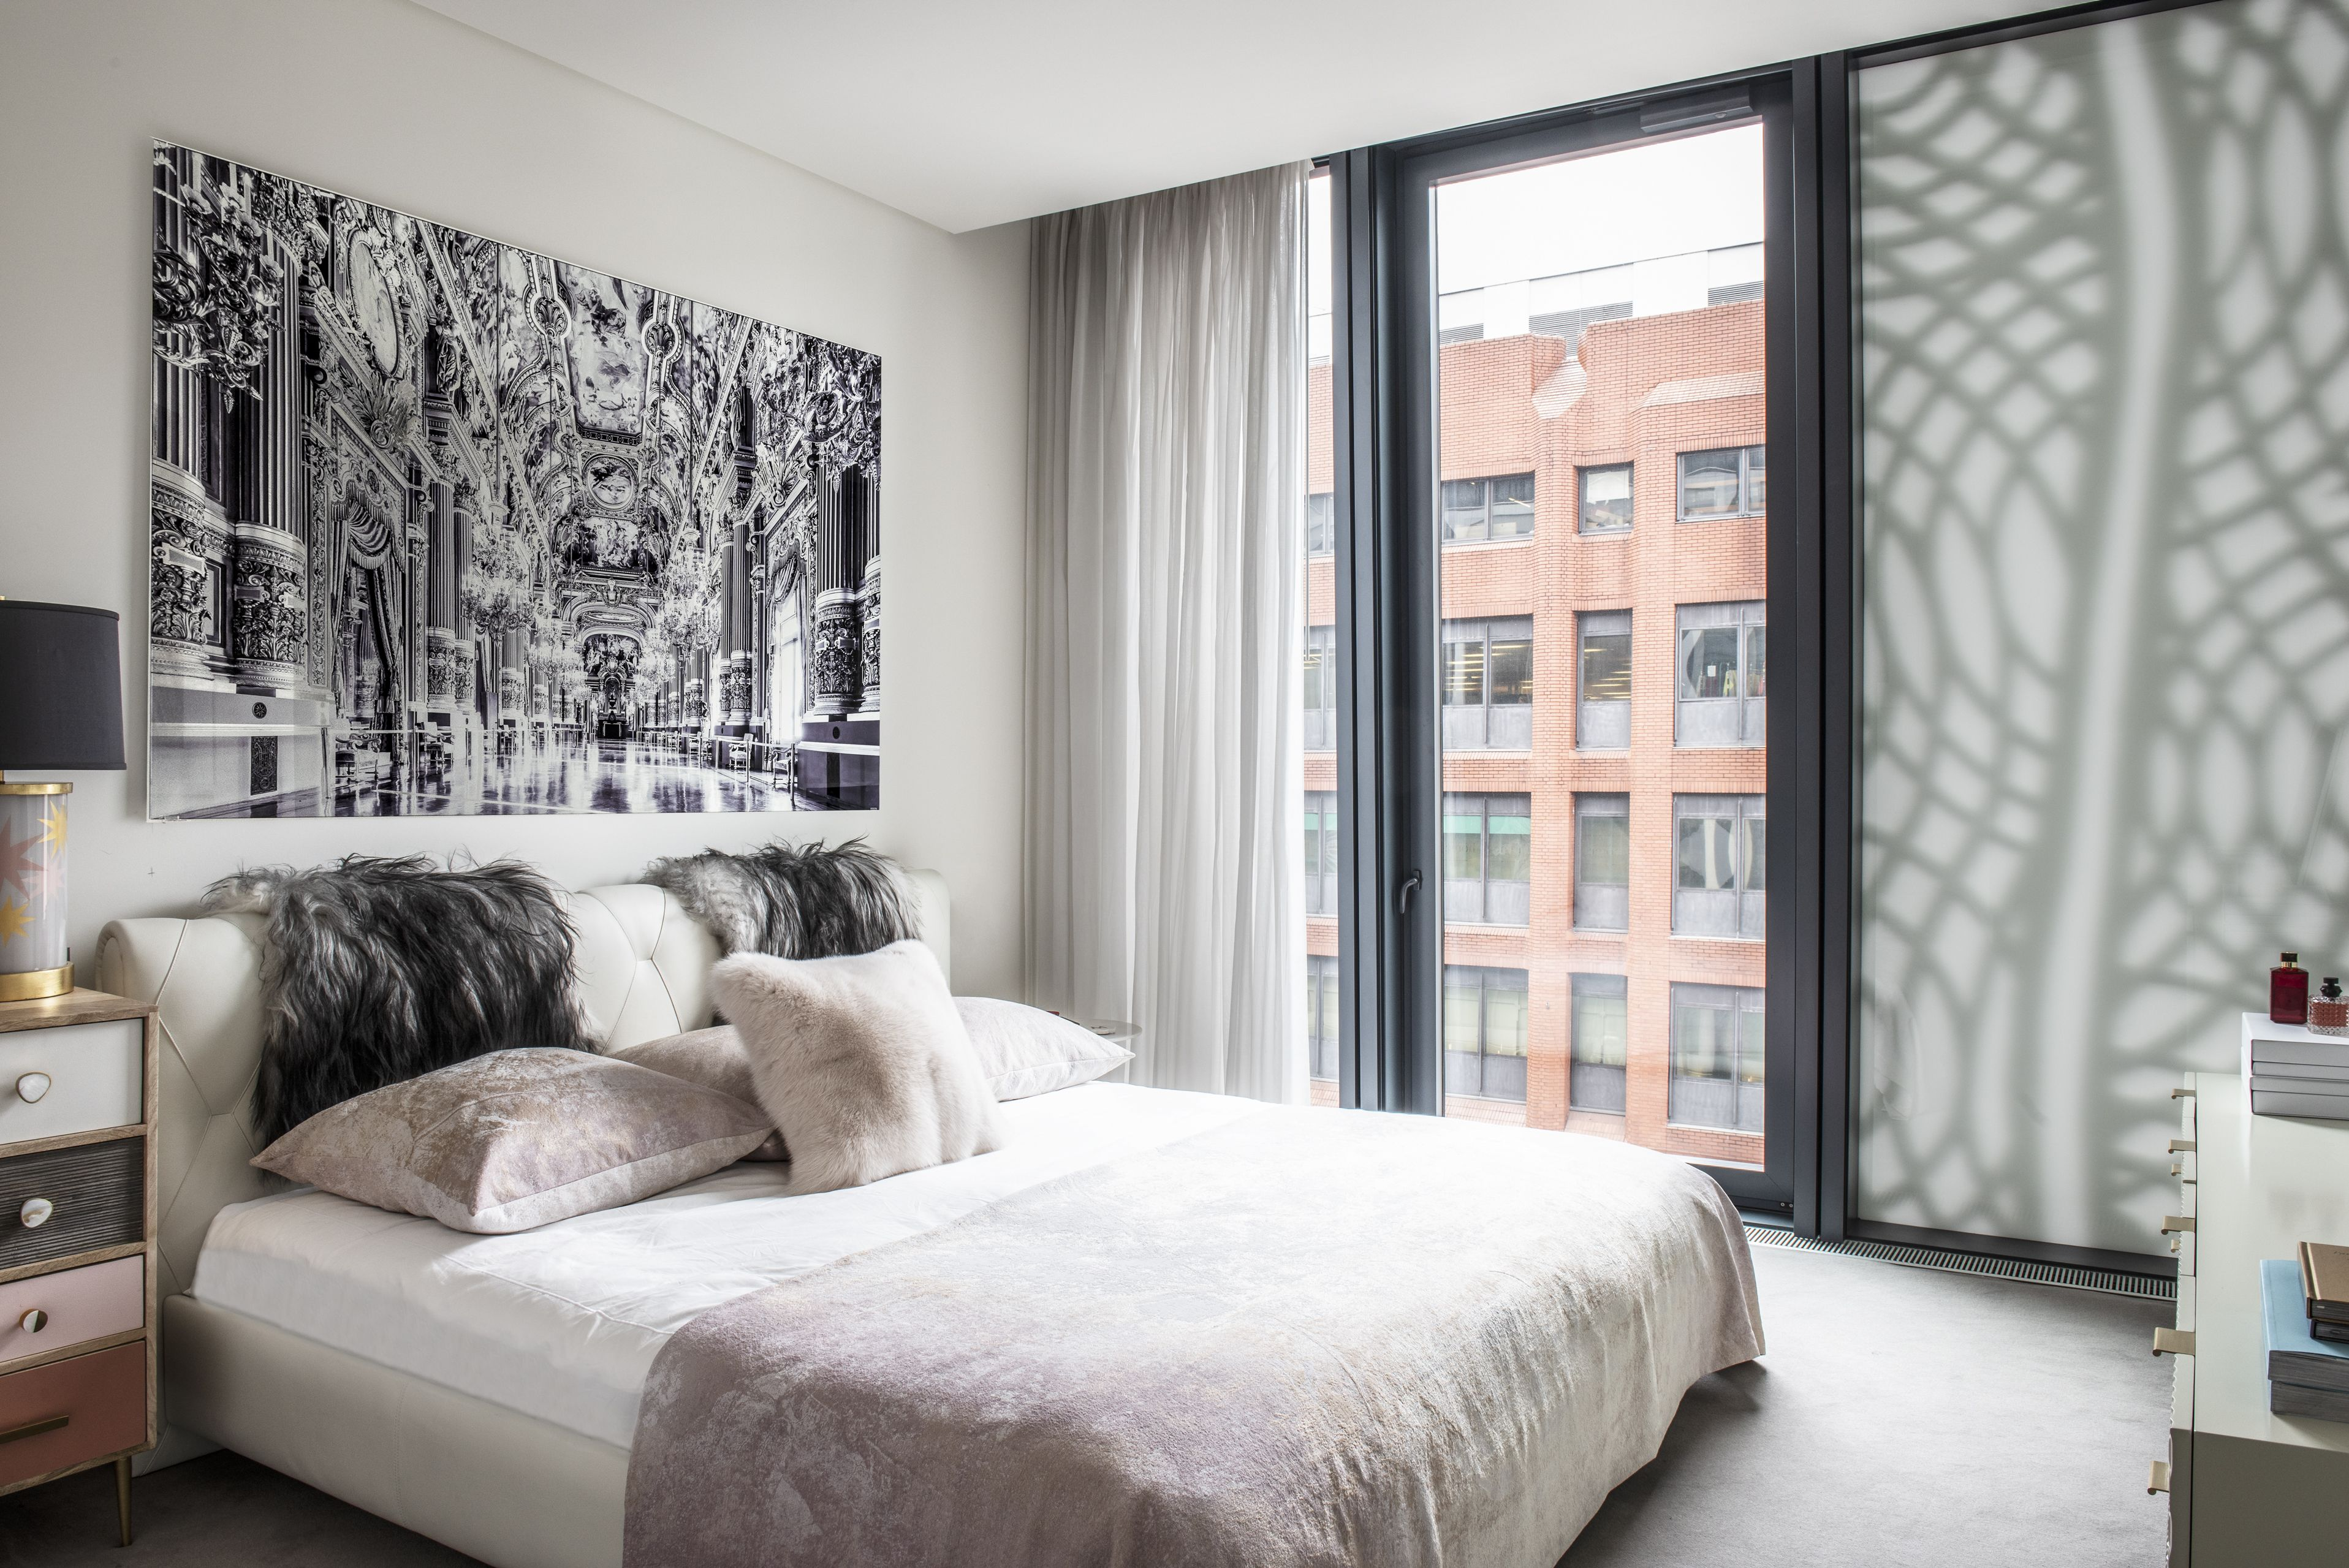 12 Inspiring Modern Bedroom Ideas - Best Modern Bedroom Designs